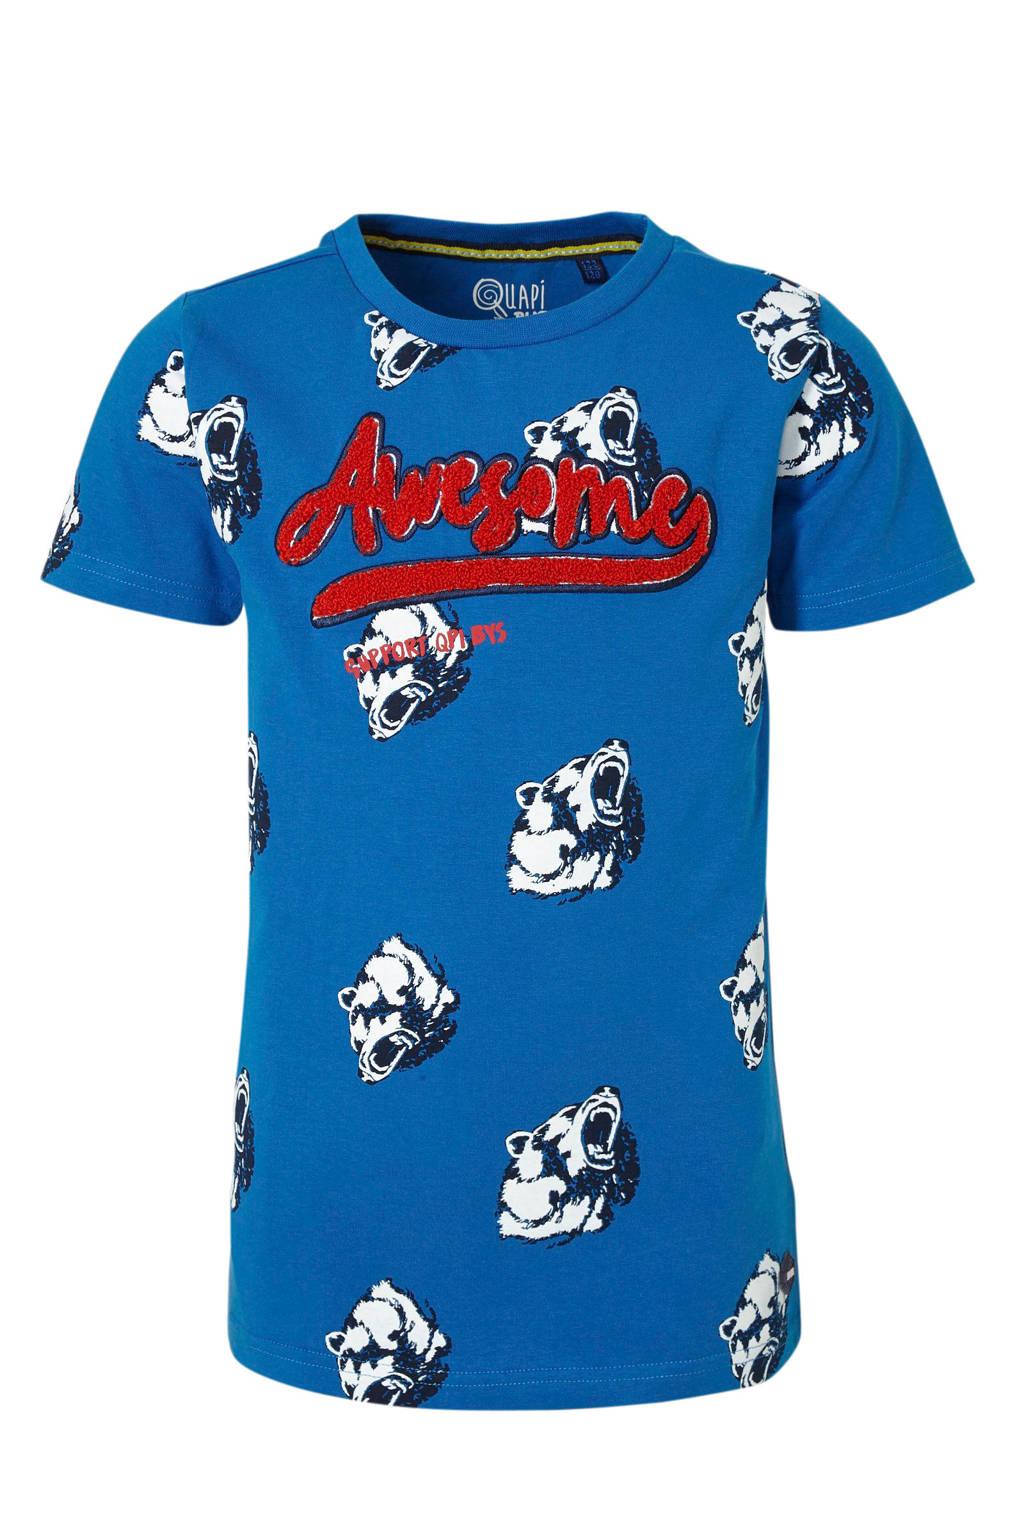 Quapi T-shirt Adian met all over print blauw/zwart/rood, Blauw/zwart/rood